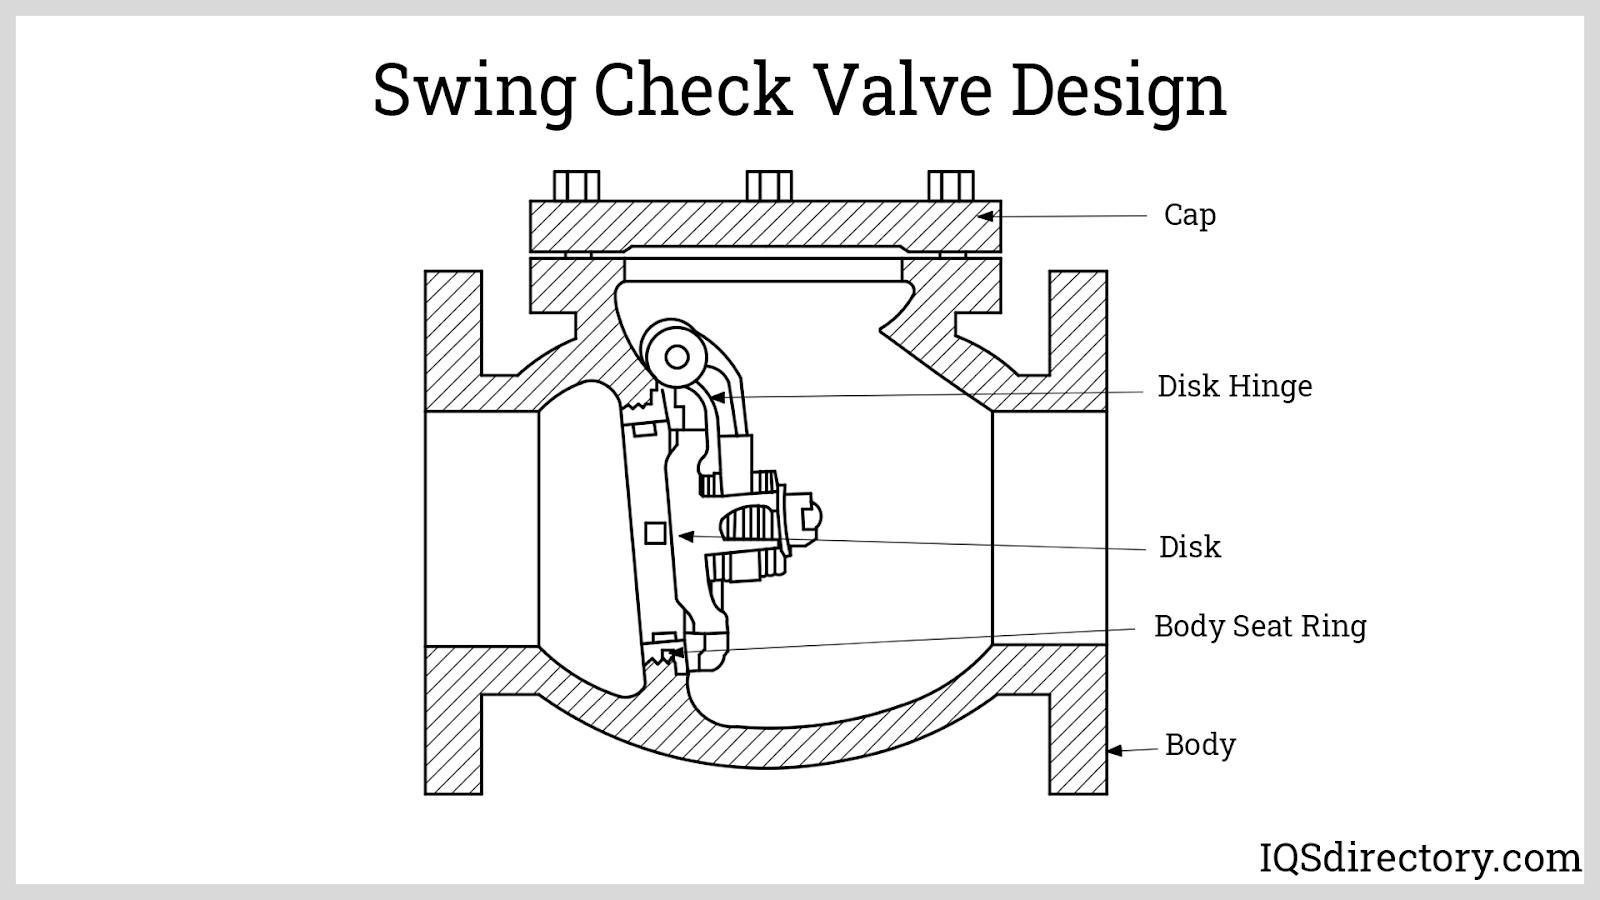 Swing Check Valve Design